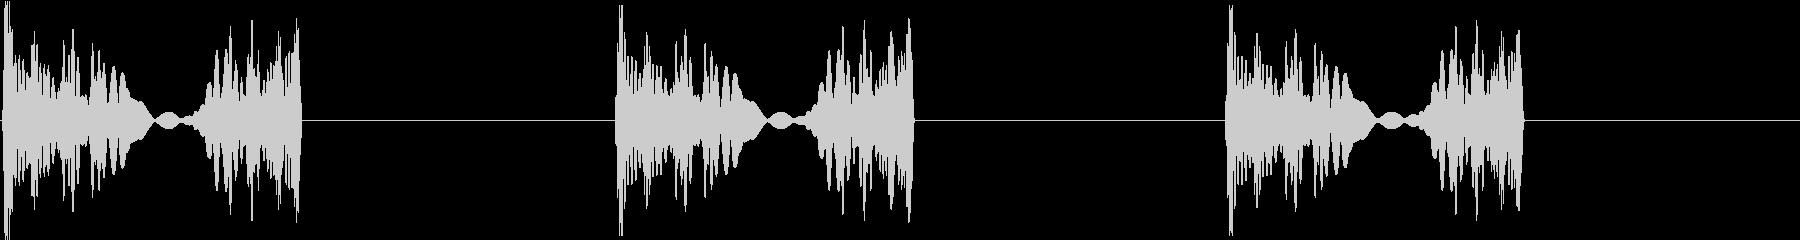 DJプレイ スクラッチ・ノイズ 21の未再生の波形